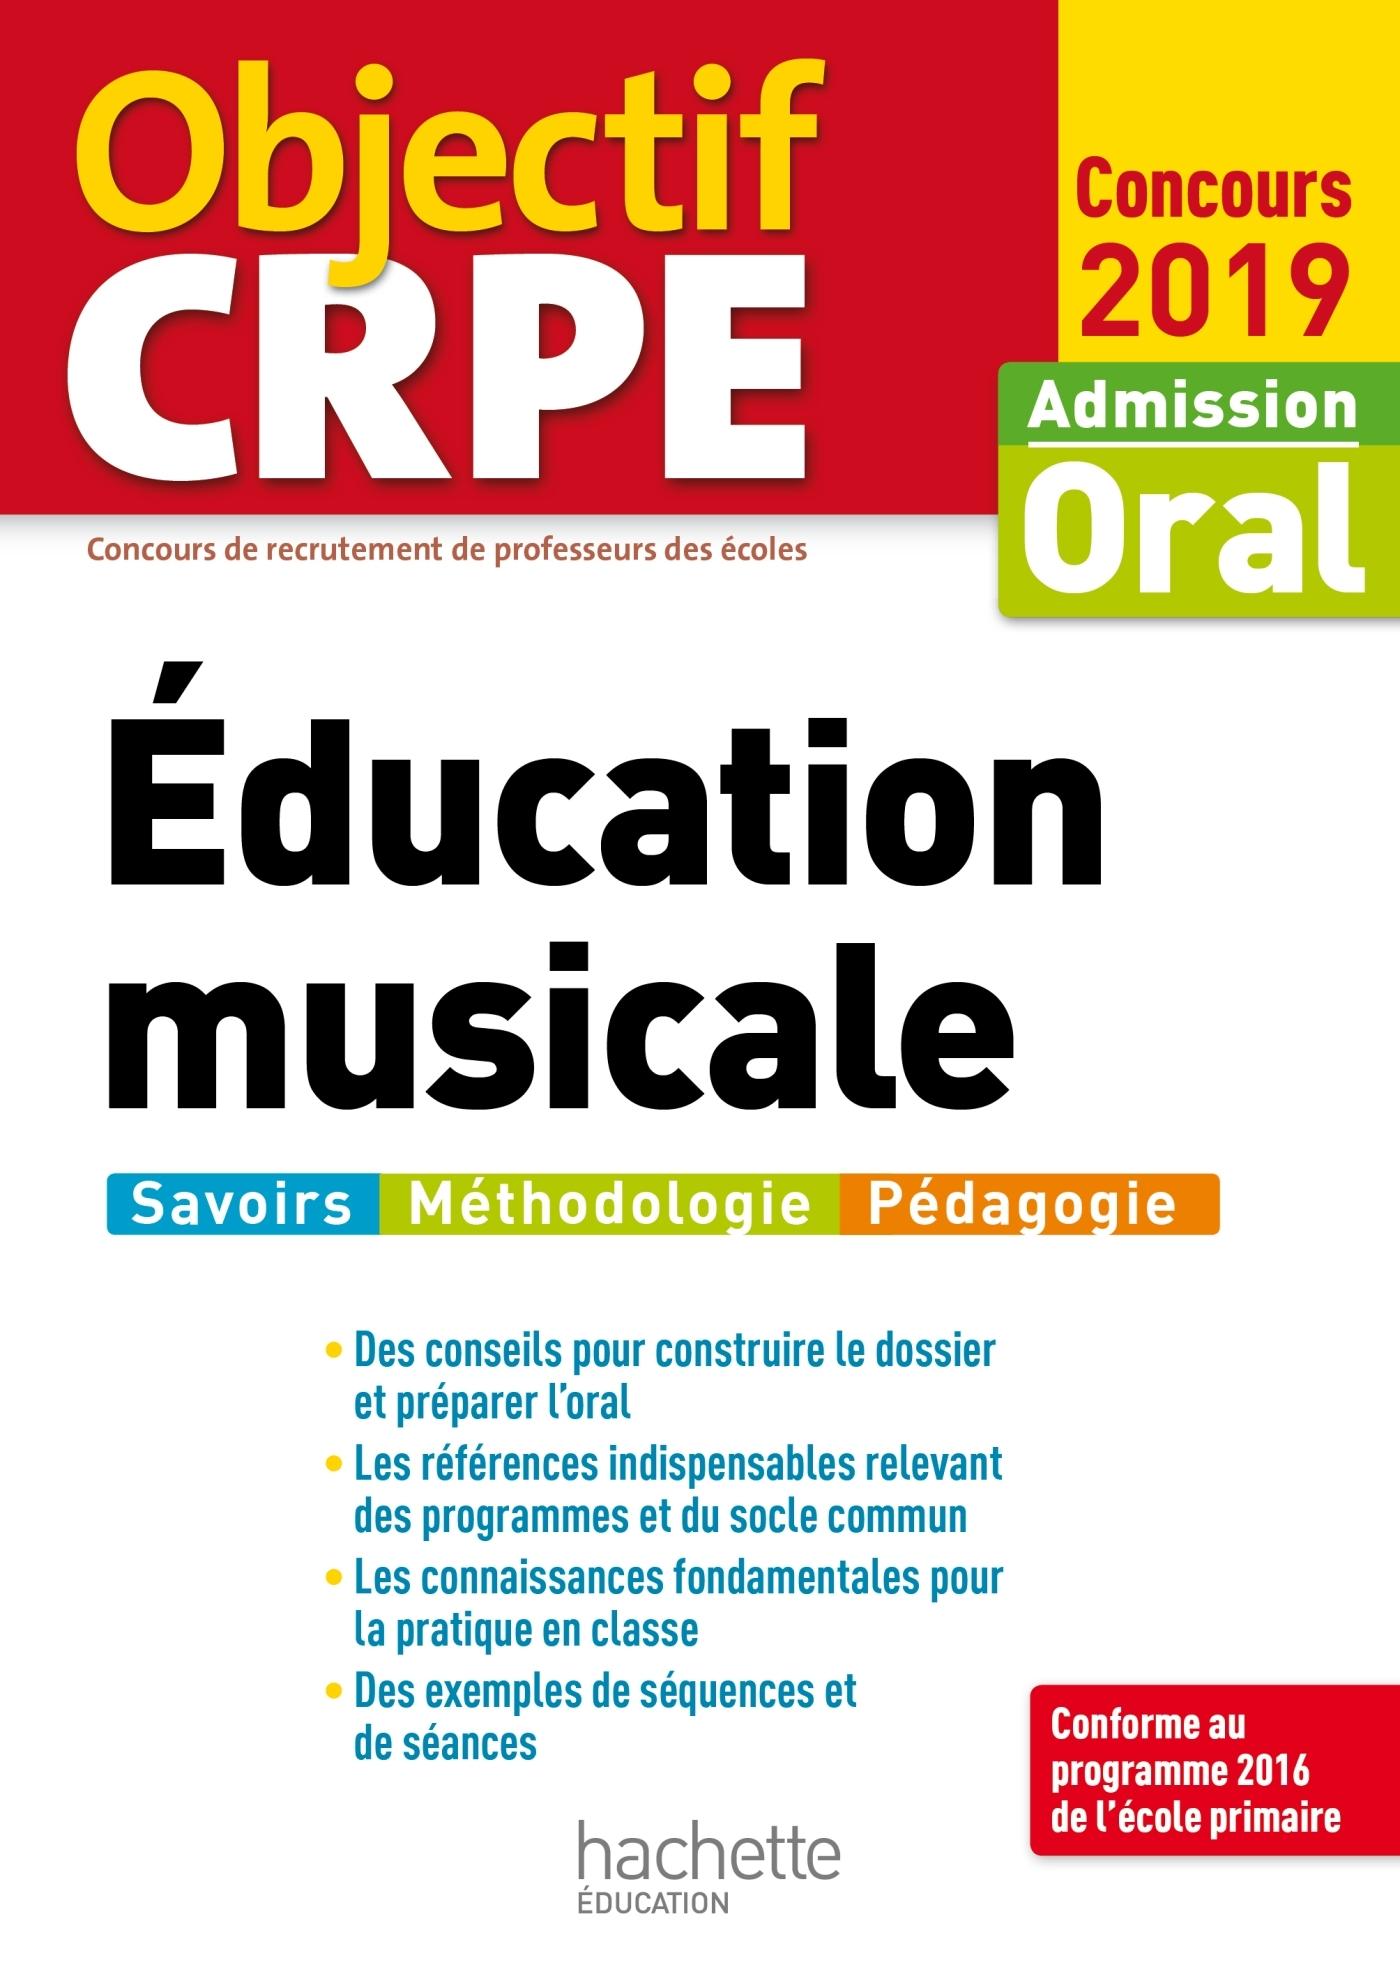 OBJECTIF CRPE EDUCATION MUSICALE 2019